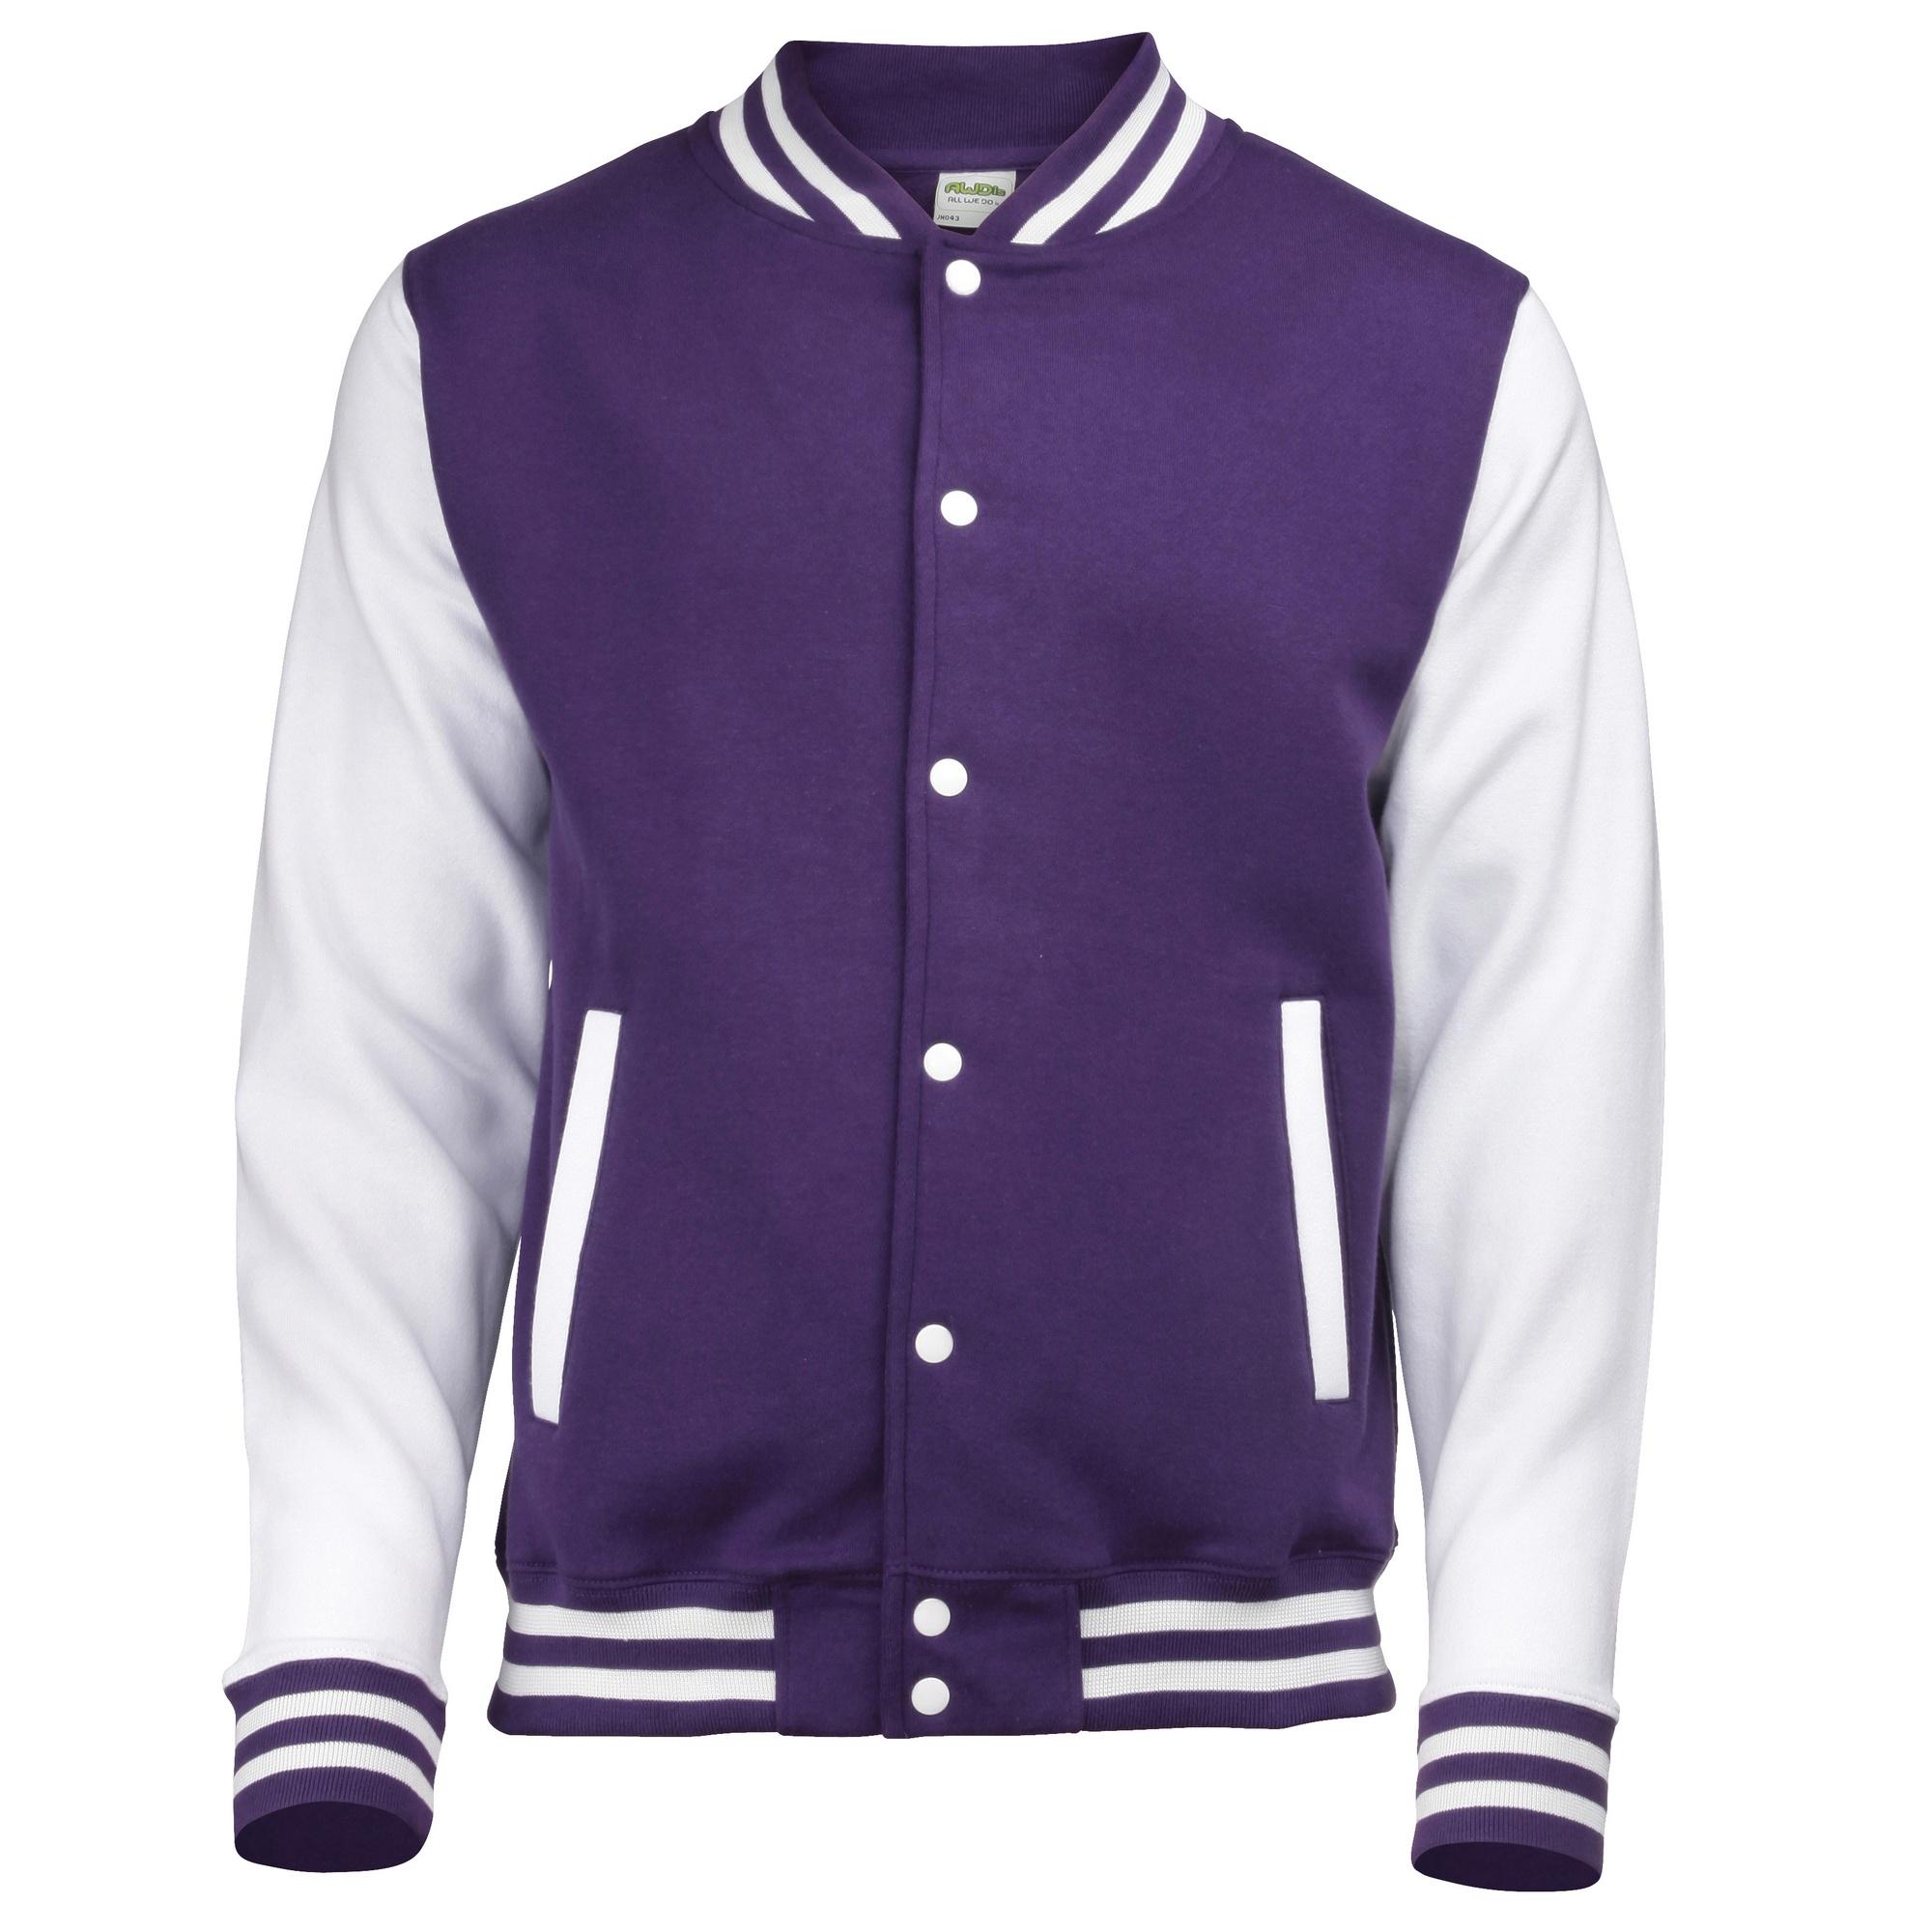 Blouson style Varsity jacket Walmart